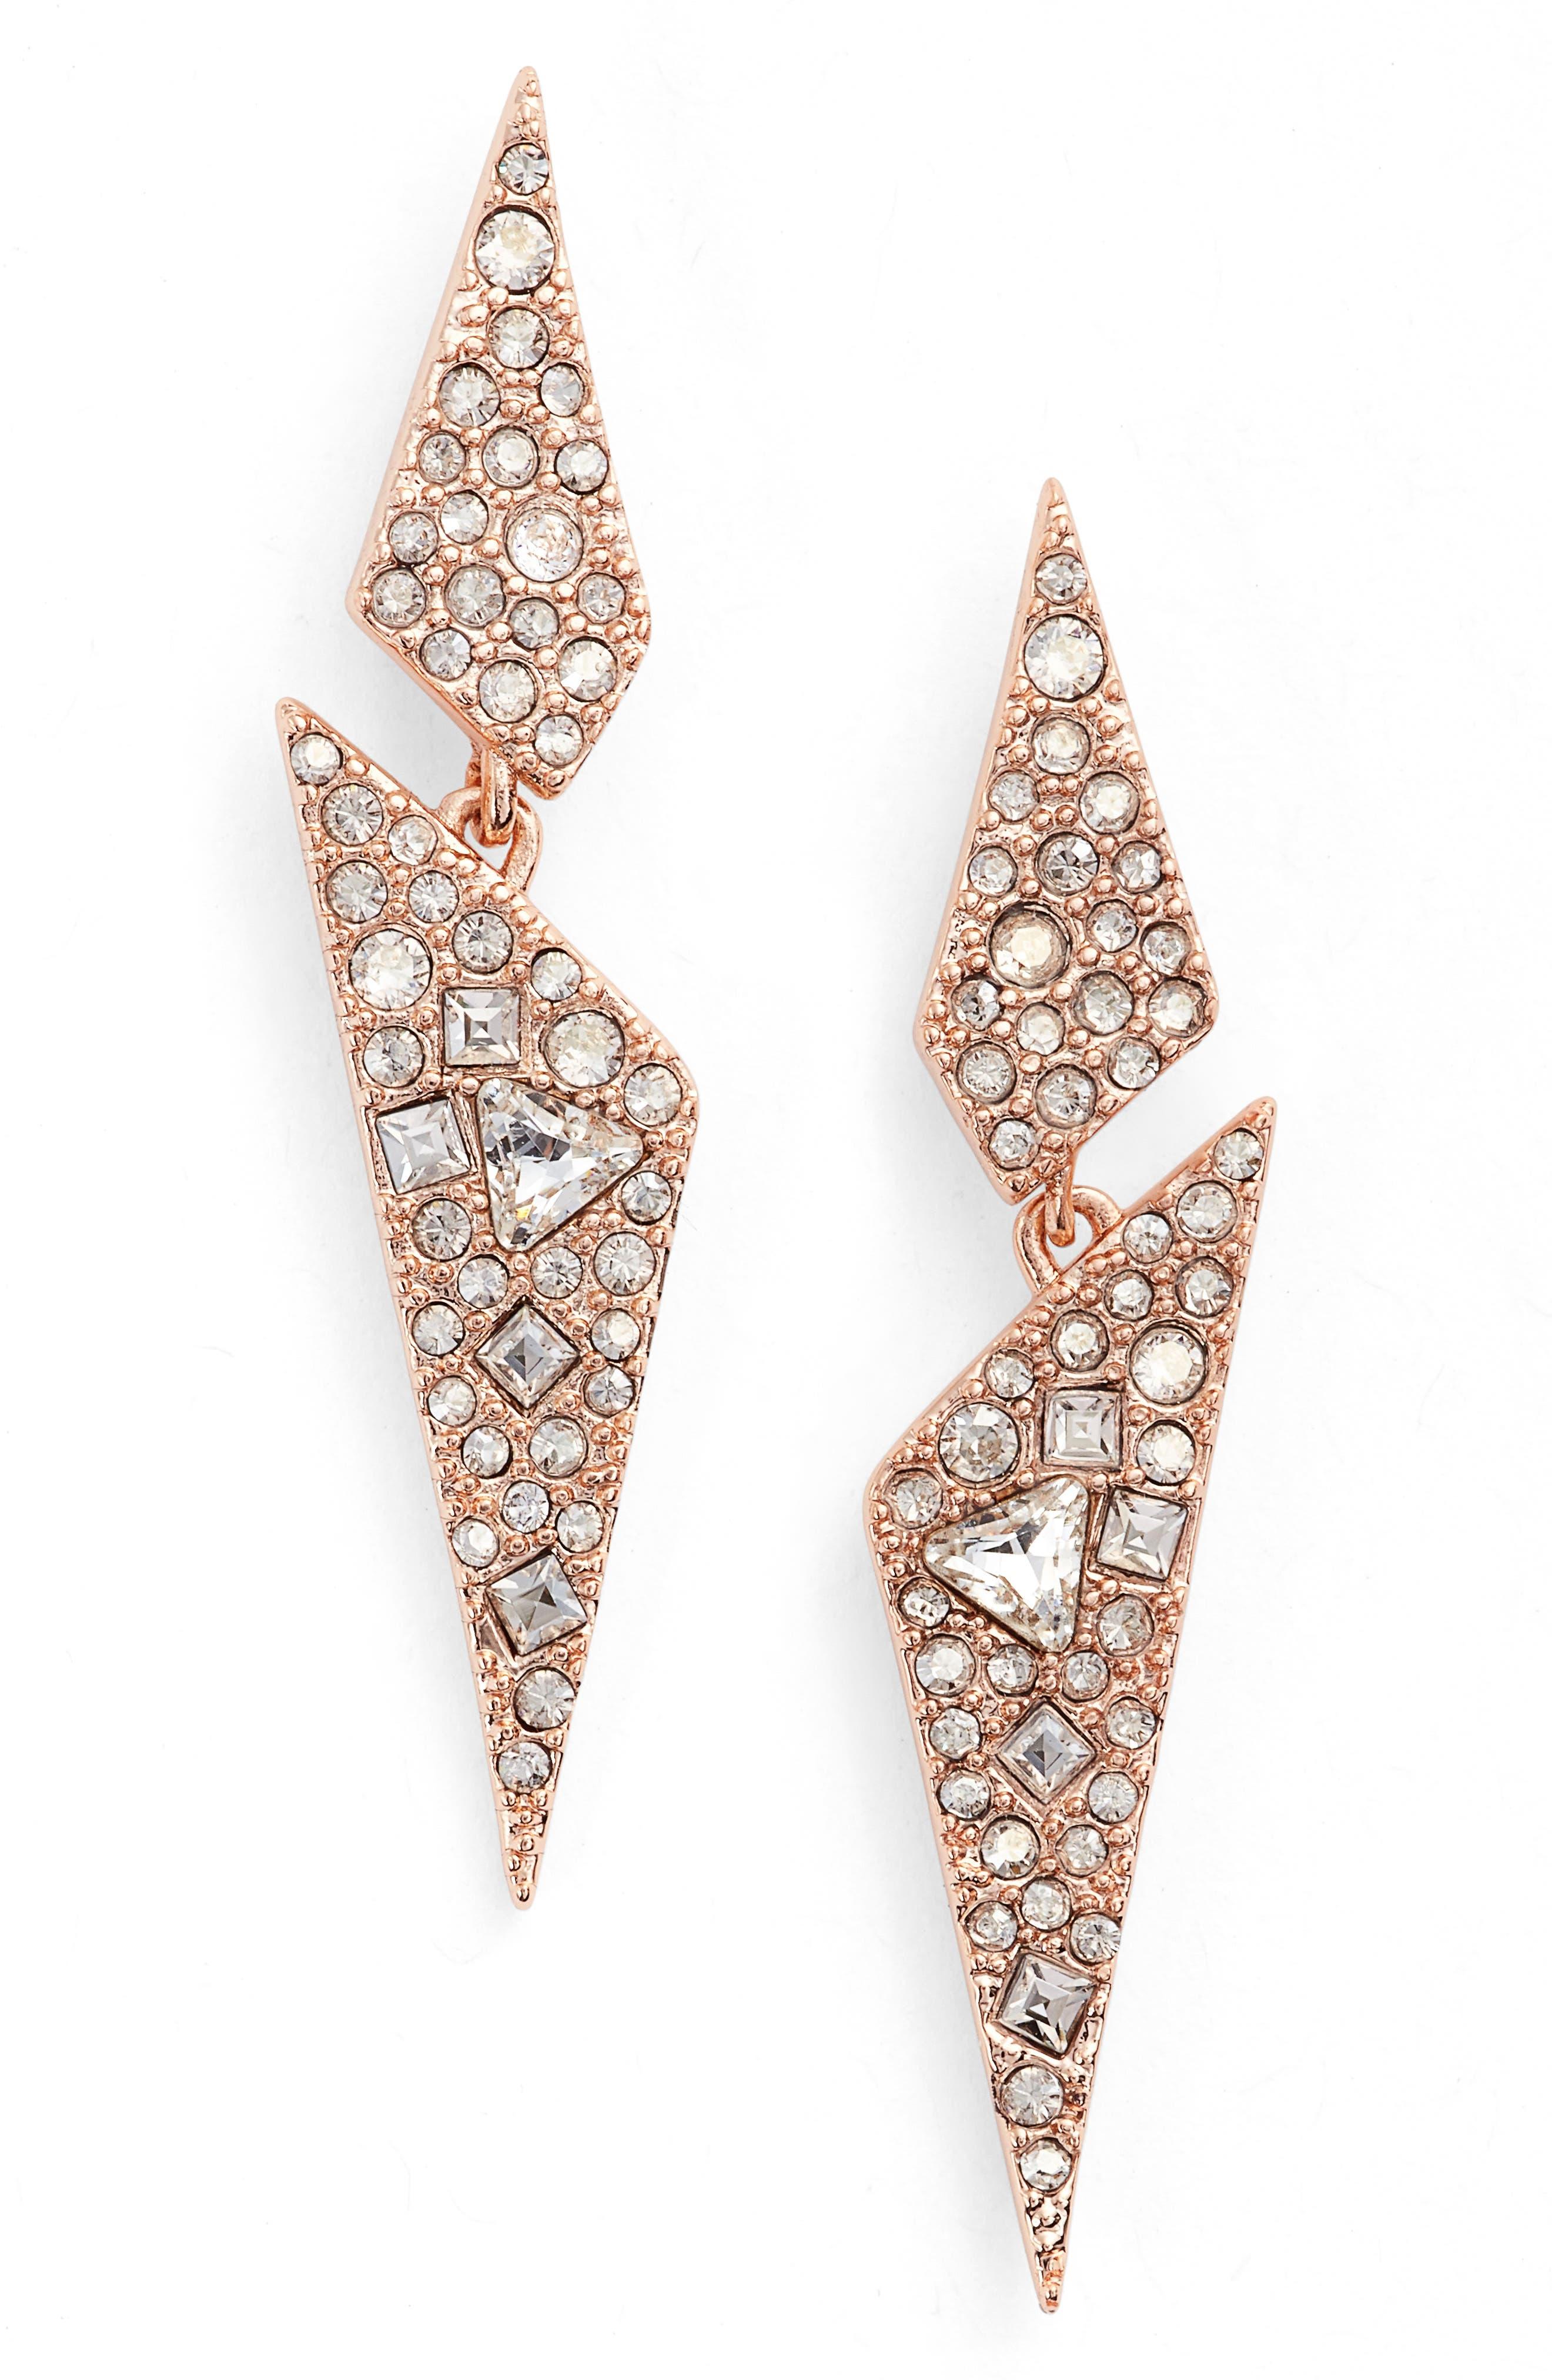 Crystal Encrusted Dangling Drop Earrings,                             Main thumbnail 1, color,                             ROSE GOLD